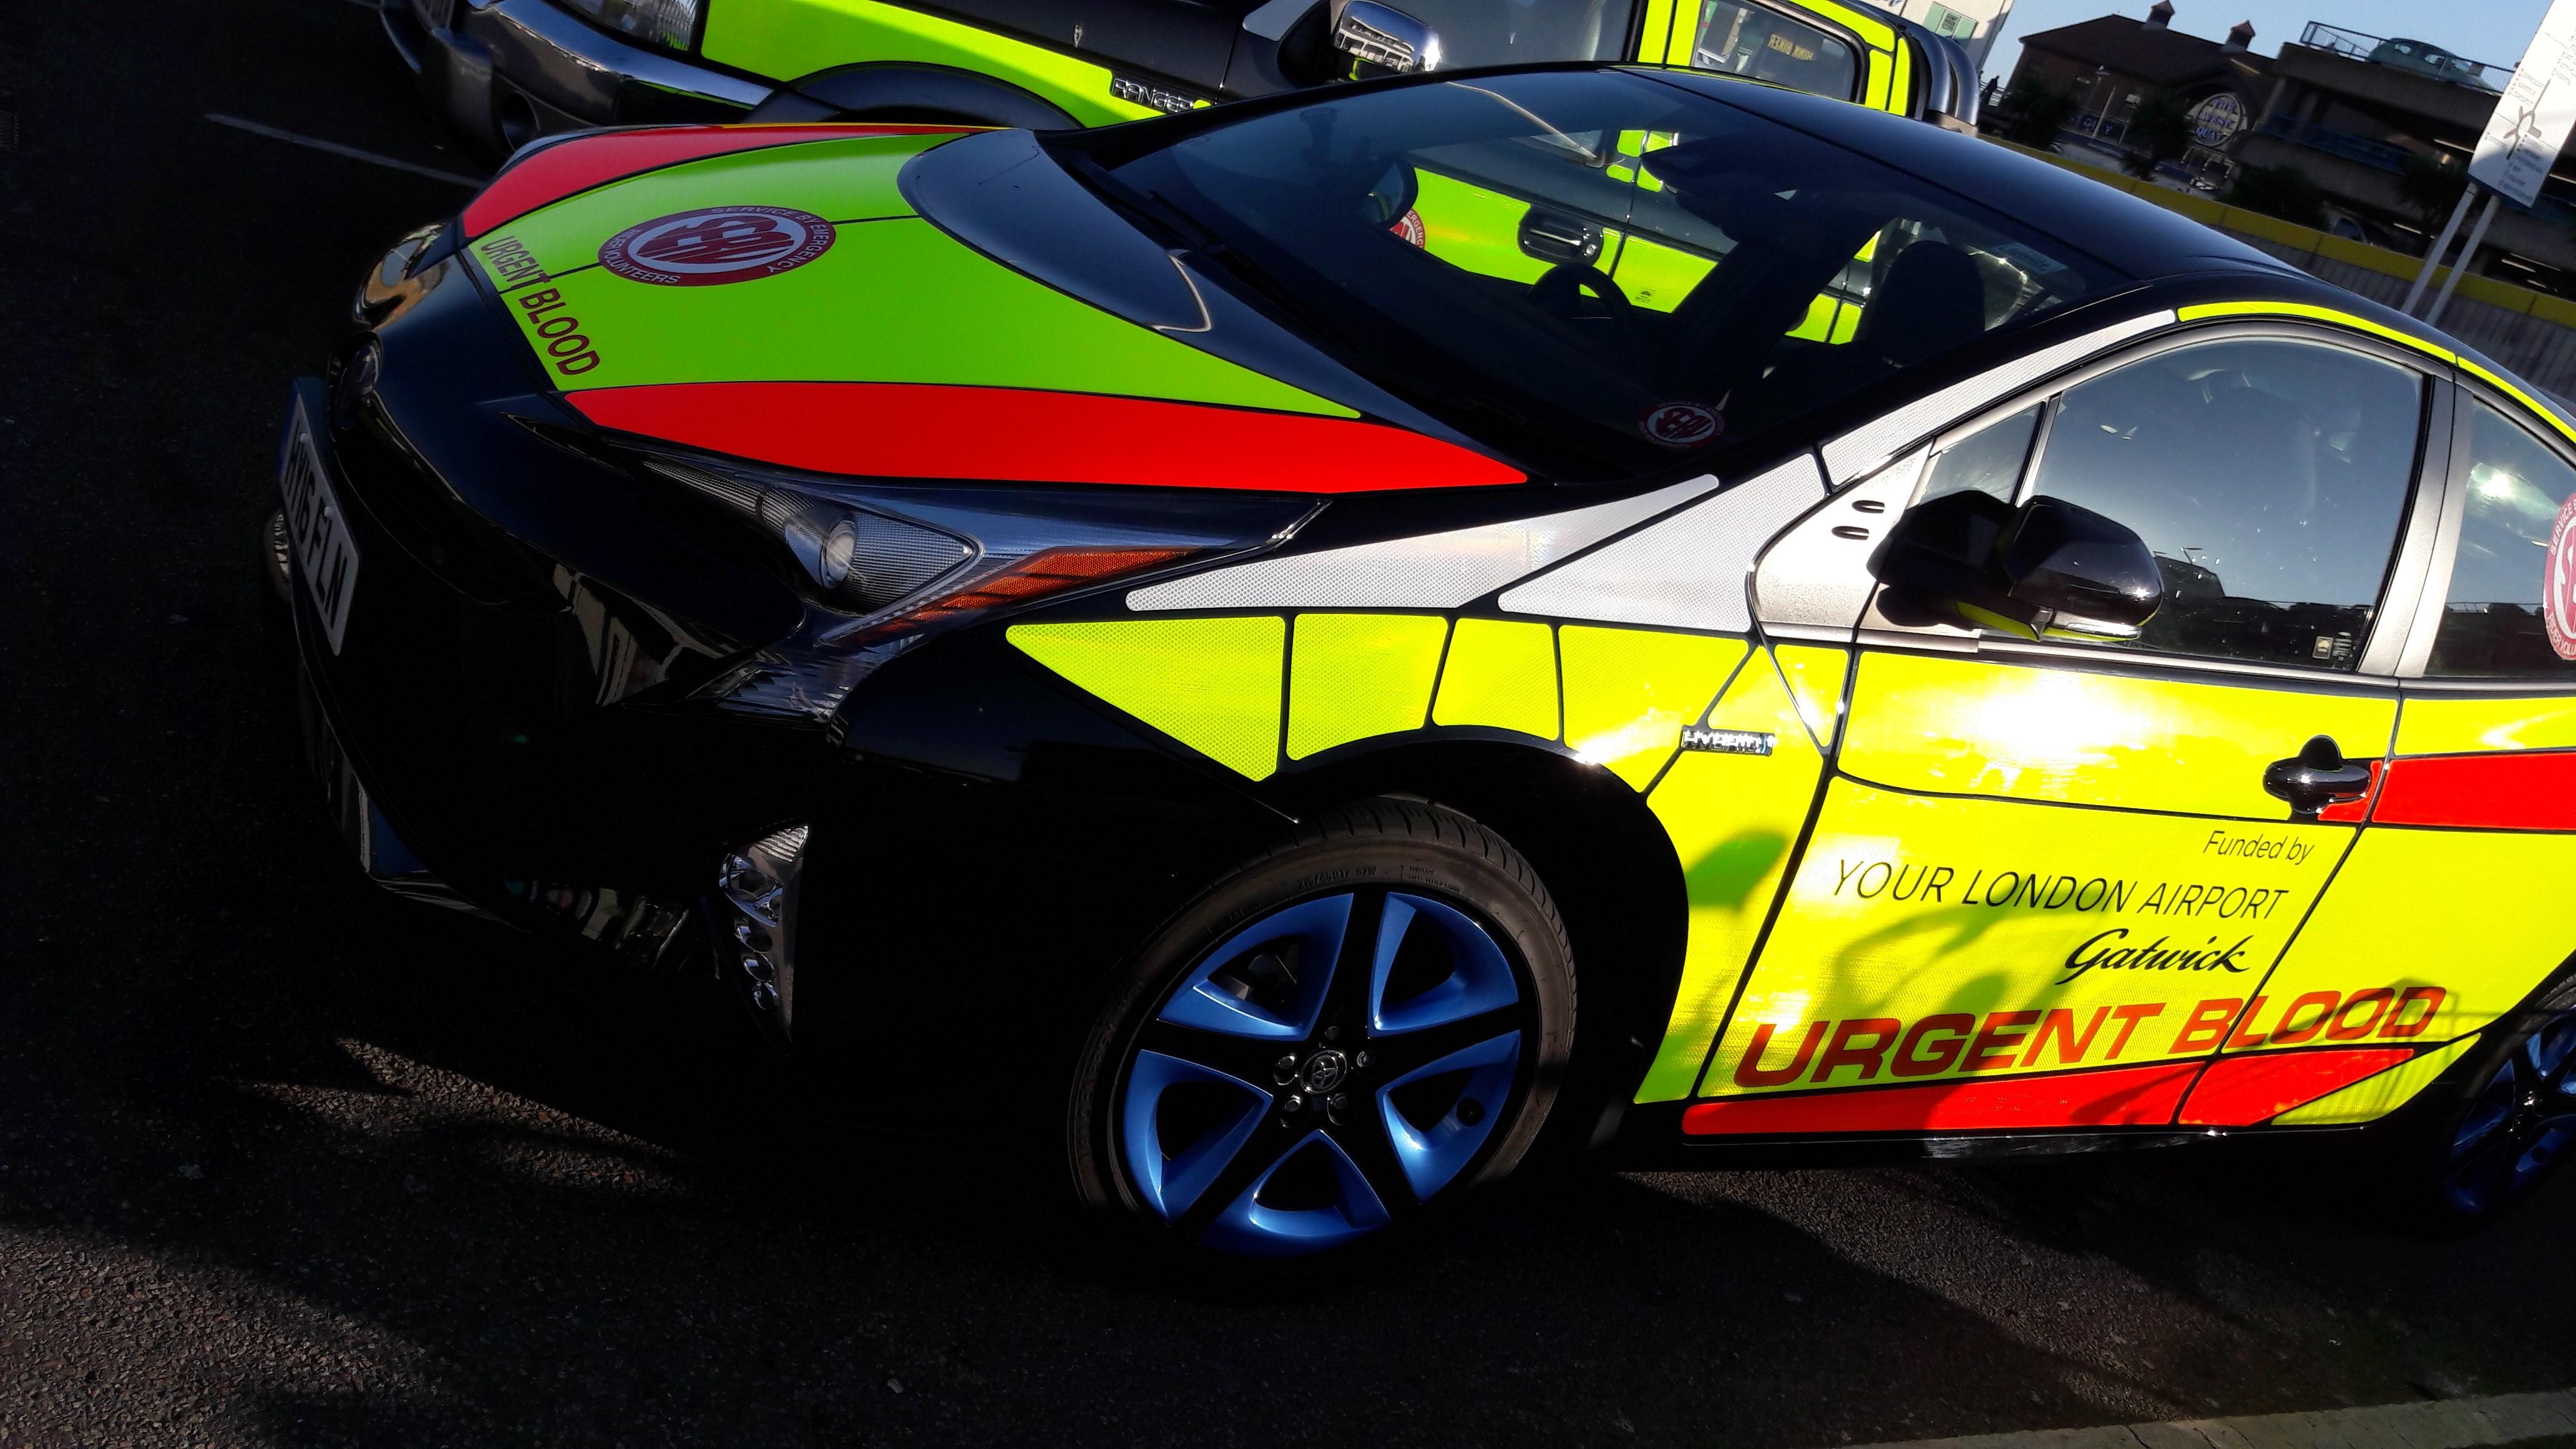 Service by Emergency Rider Volunteers (SERV) Sussex